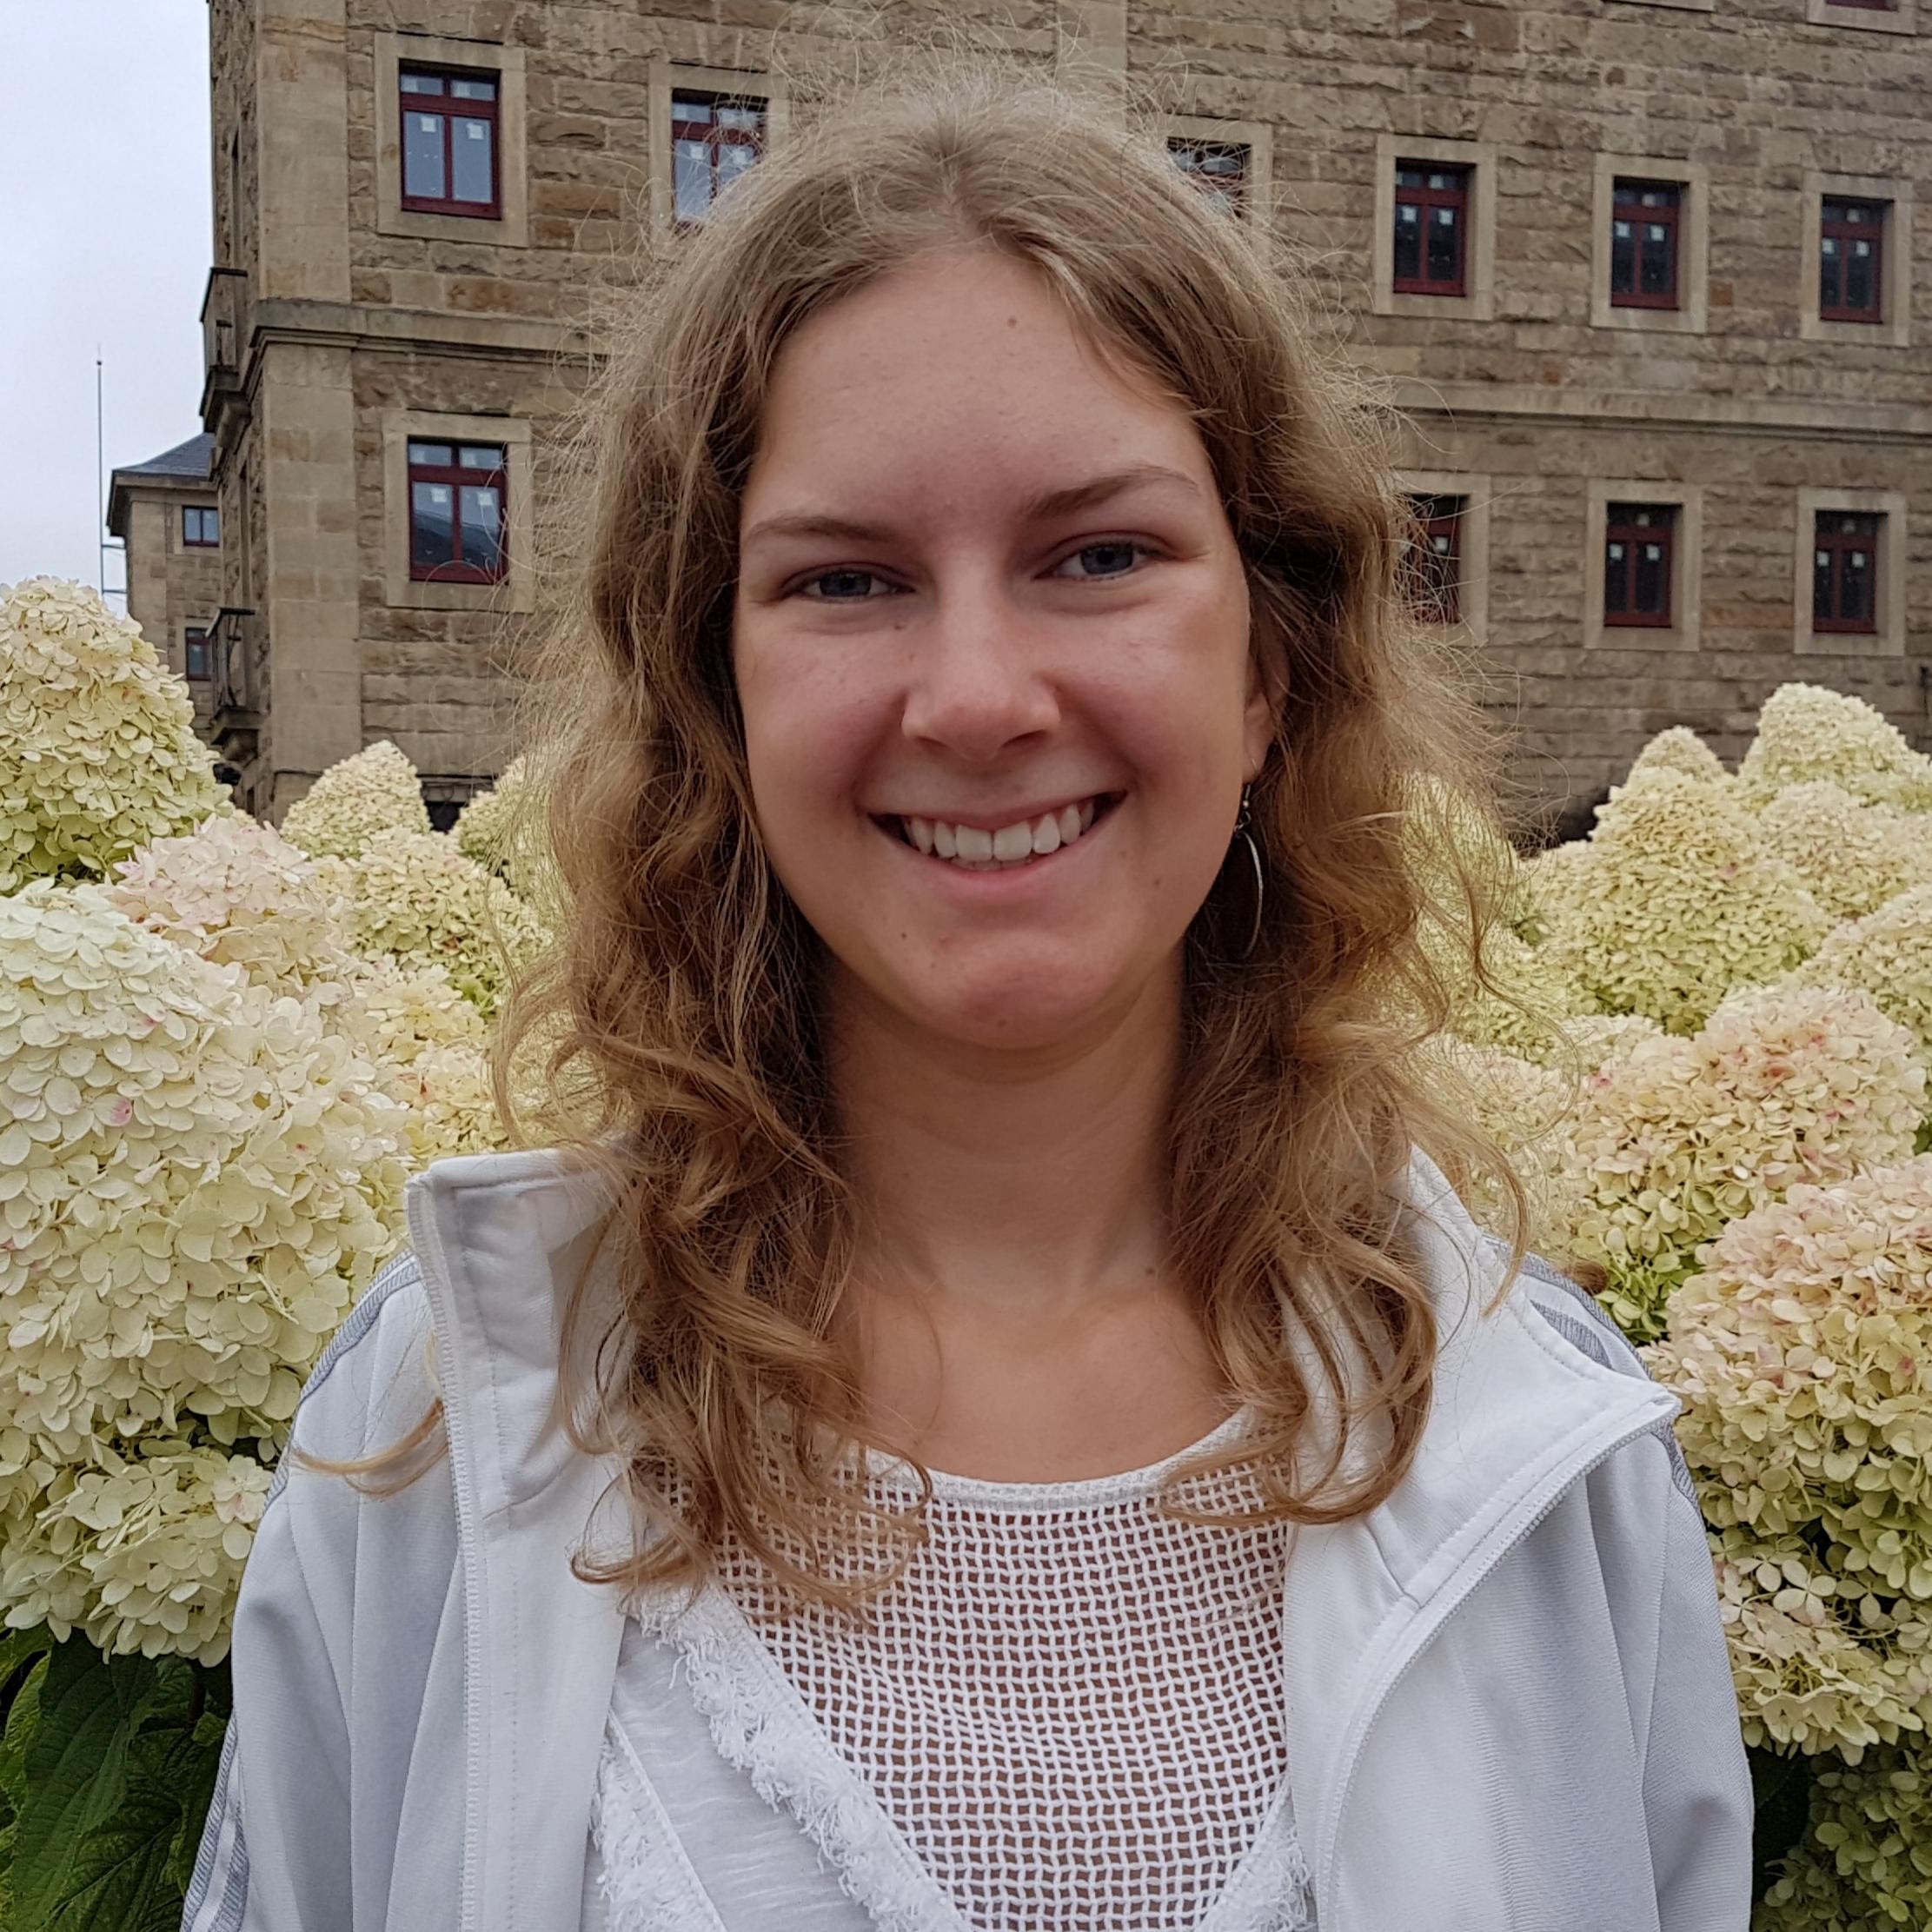 Julia Winbäck